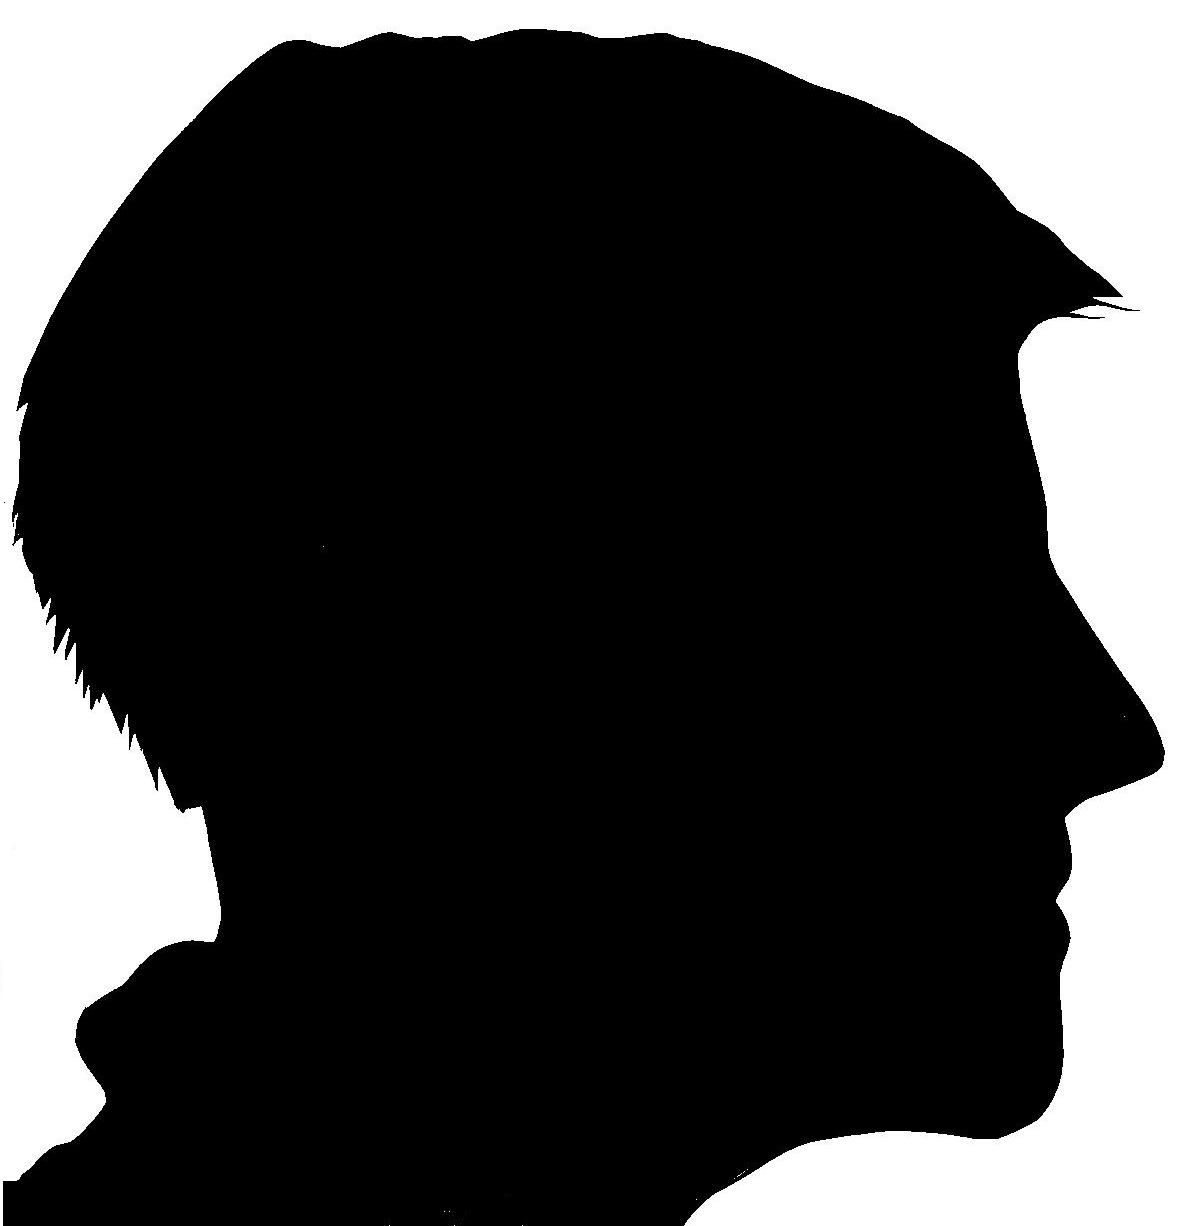 Face Profile Clipart - Clipart Suggest